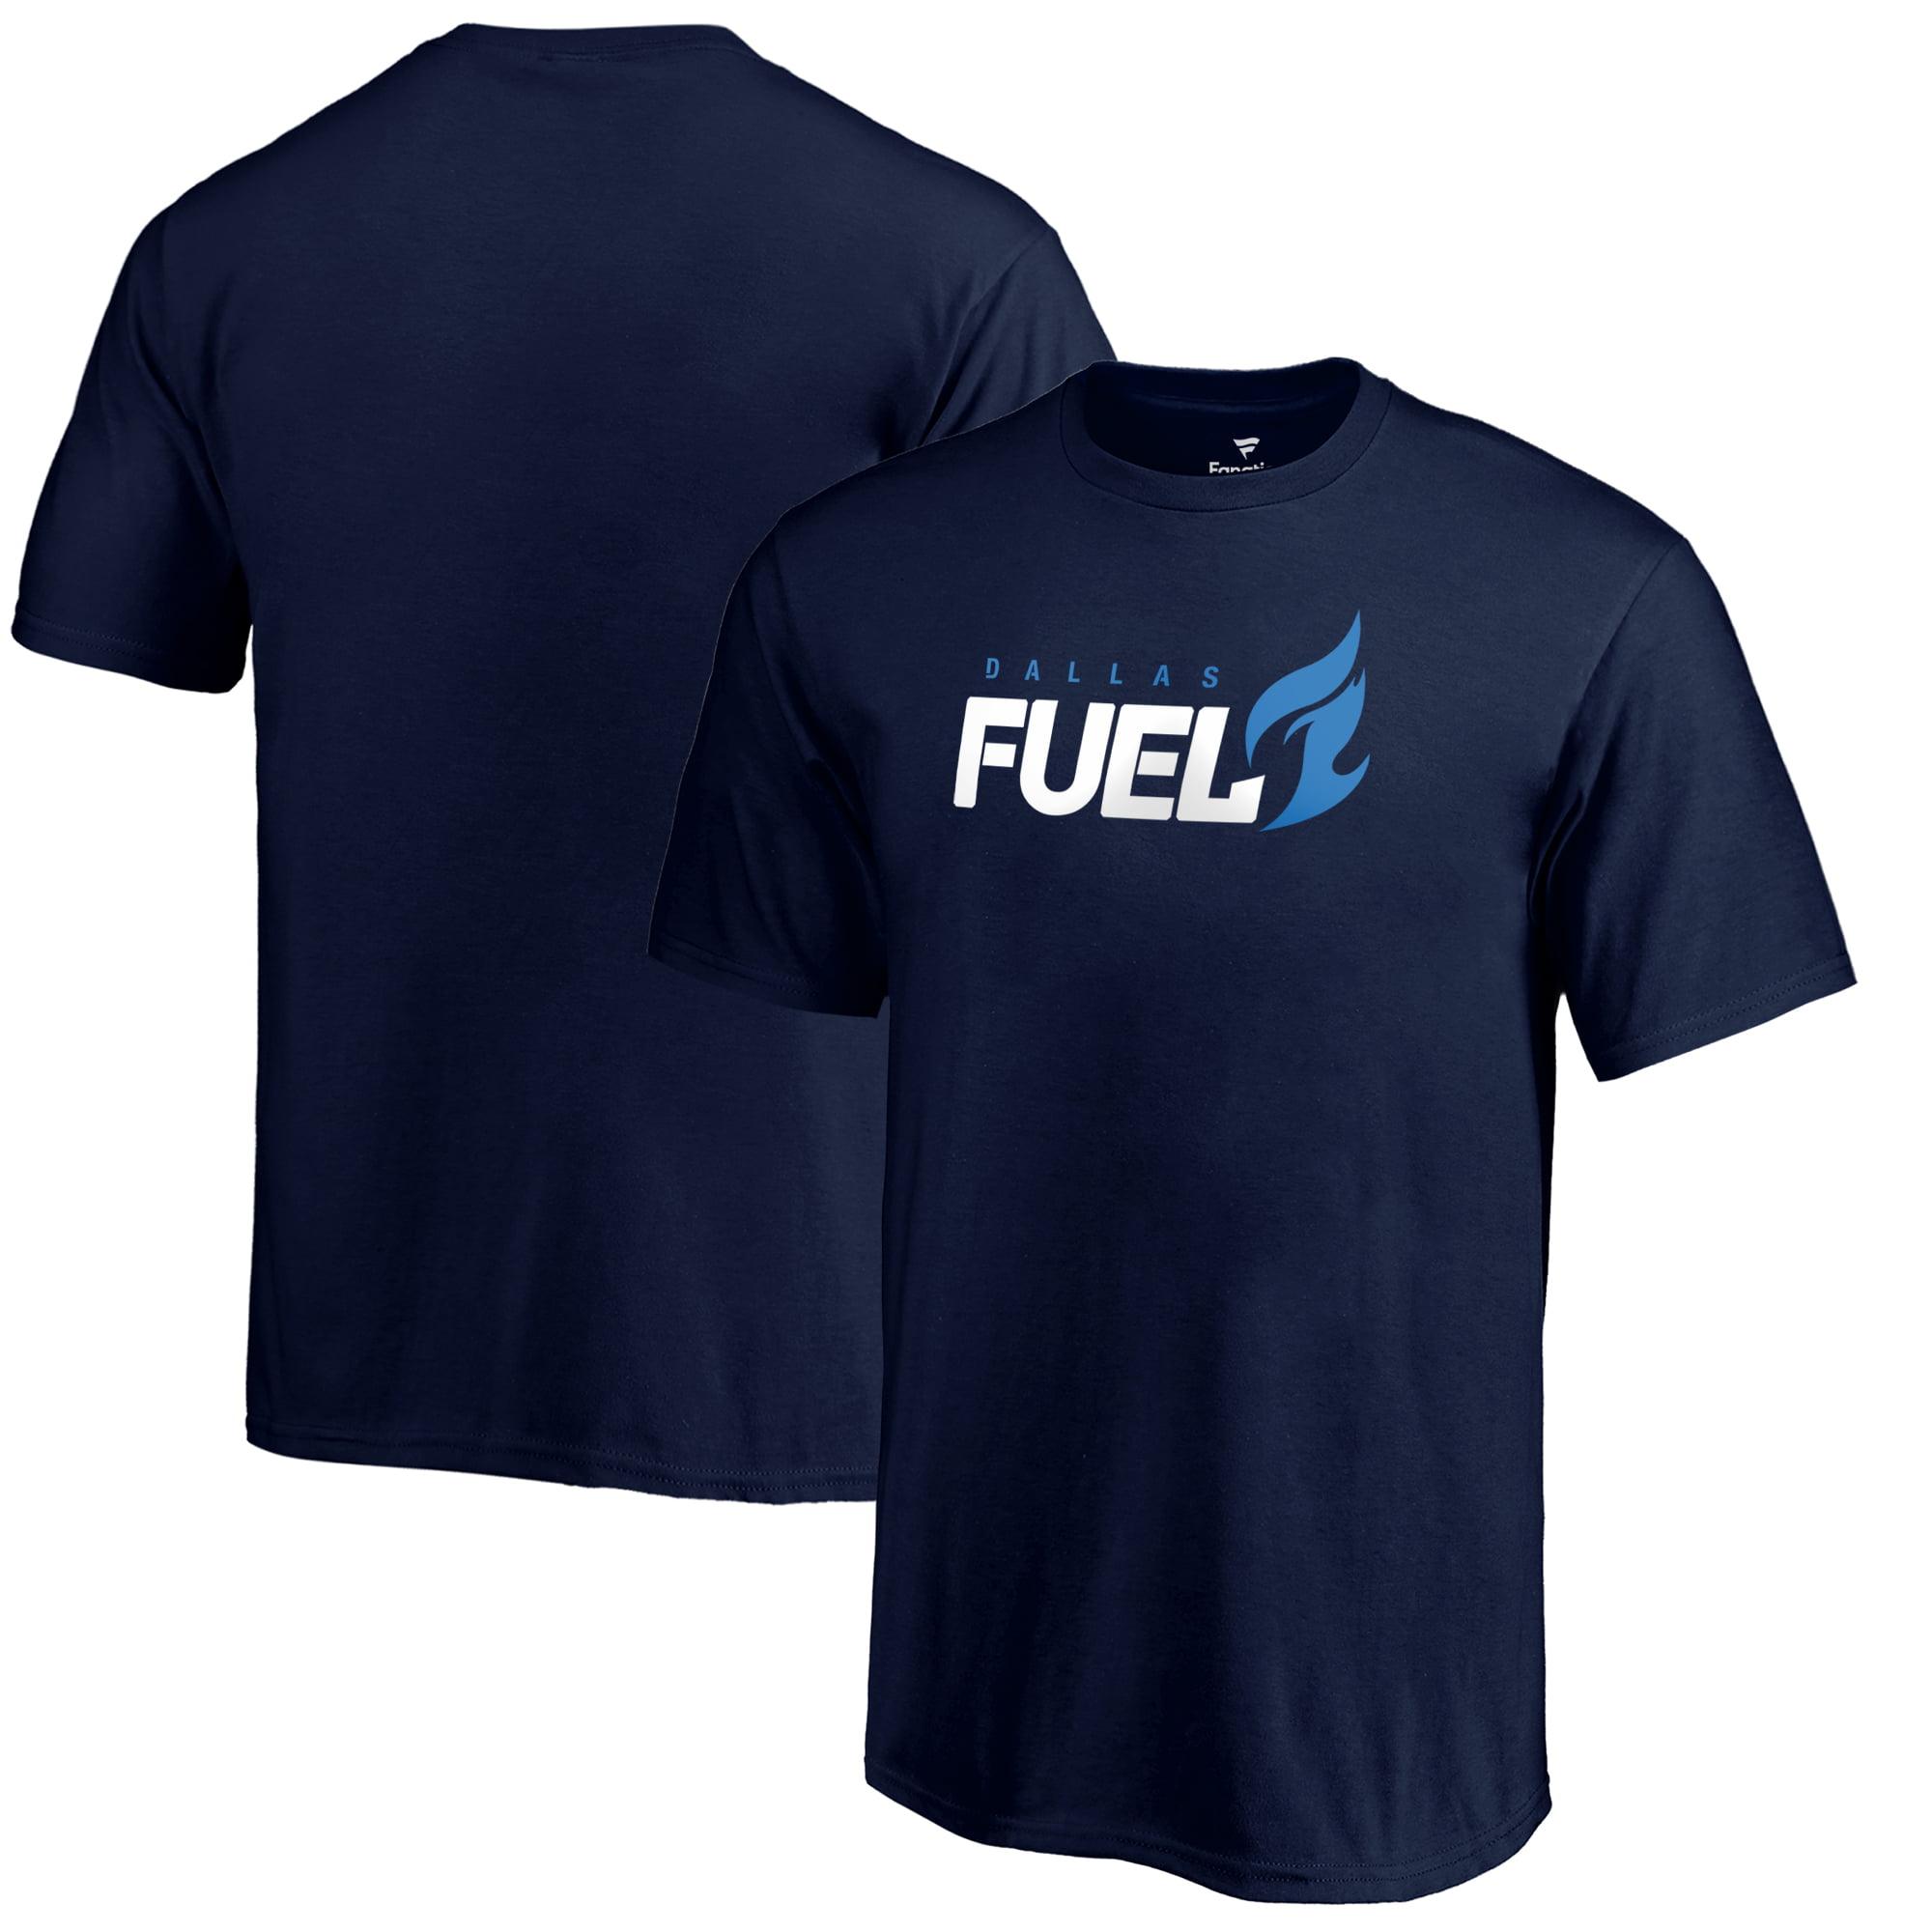 Dallas Fuel Fanatics Branded Youth Team Identity T-Shirt - Navy